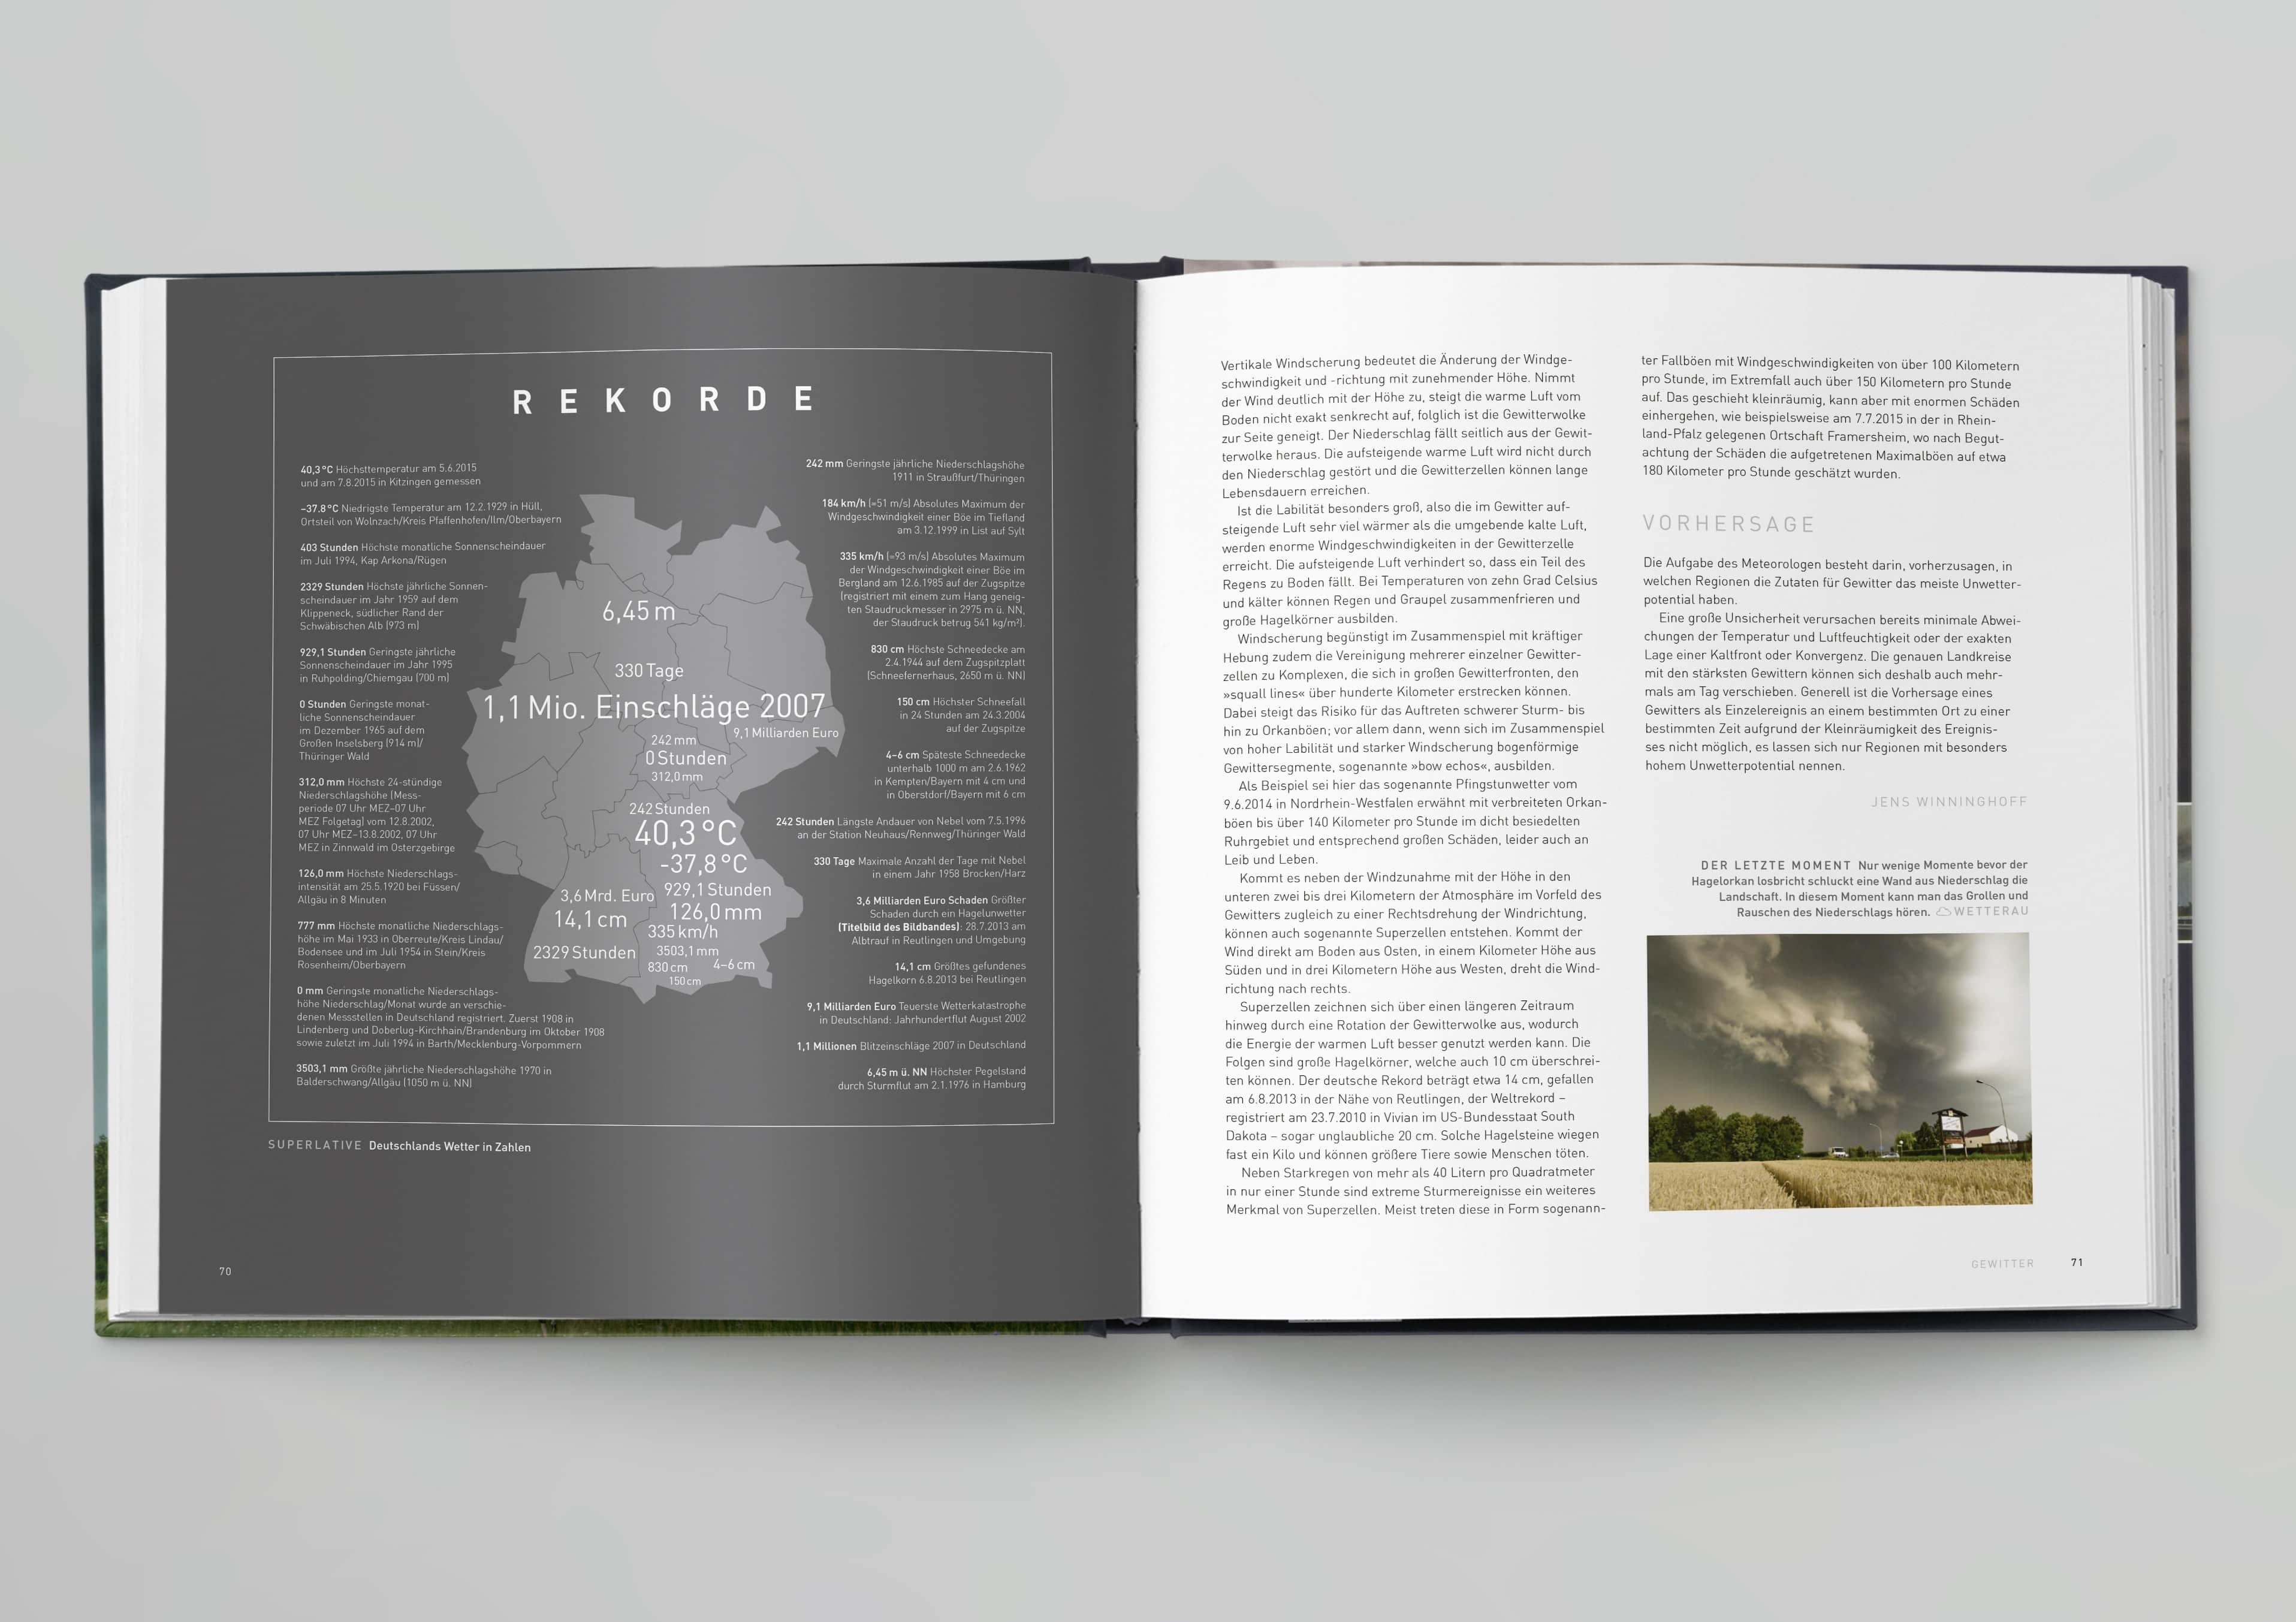 Frederking-Sturmjaeger-IN04